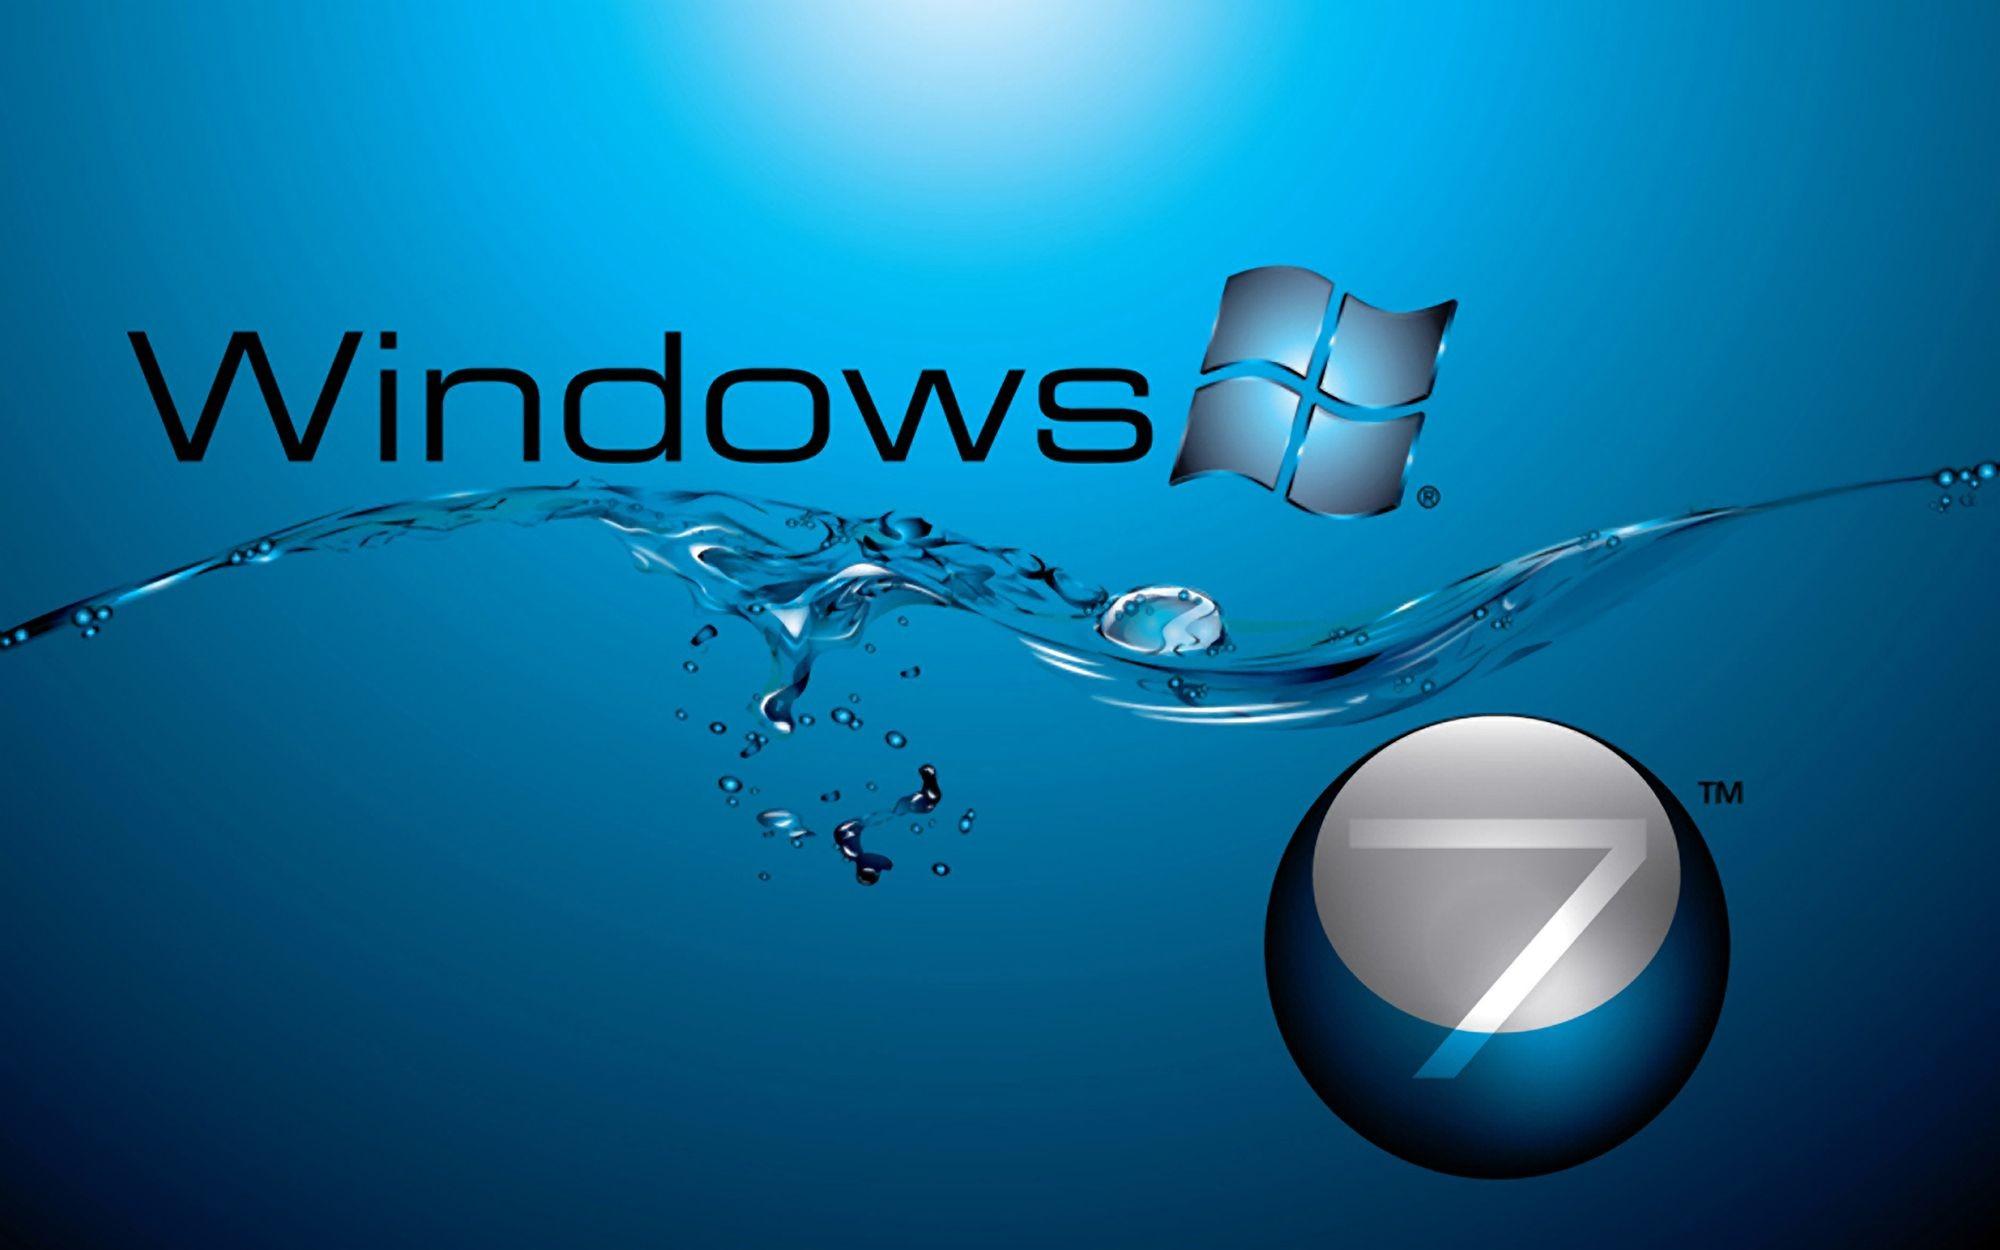 Windows Wallpapers Hd Wallpapers